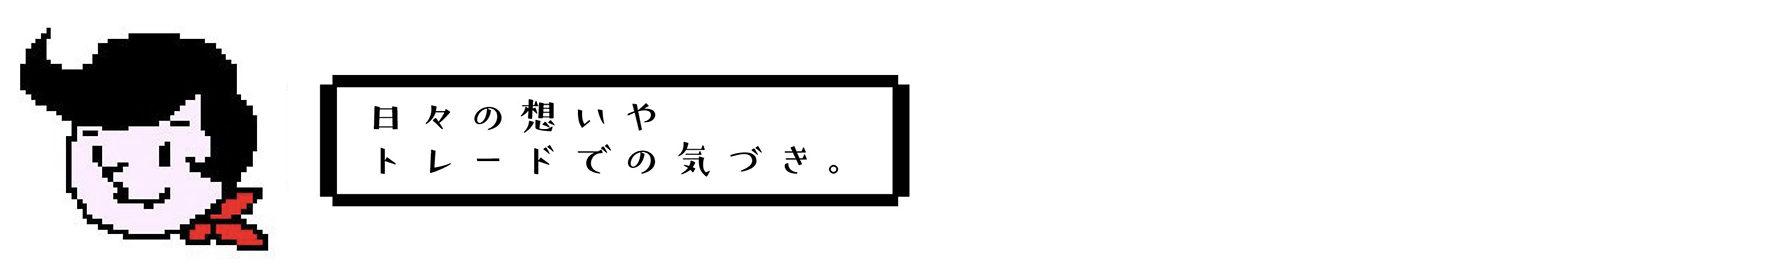 FX十四楼(トーシロー・ガチトレFX)